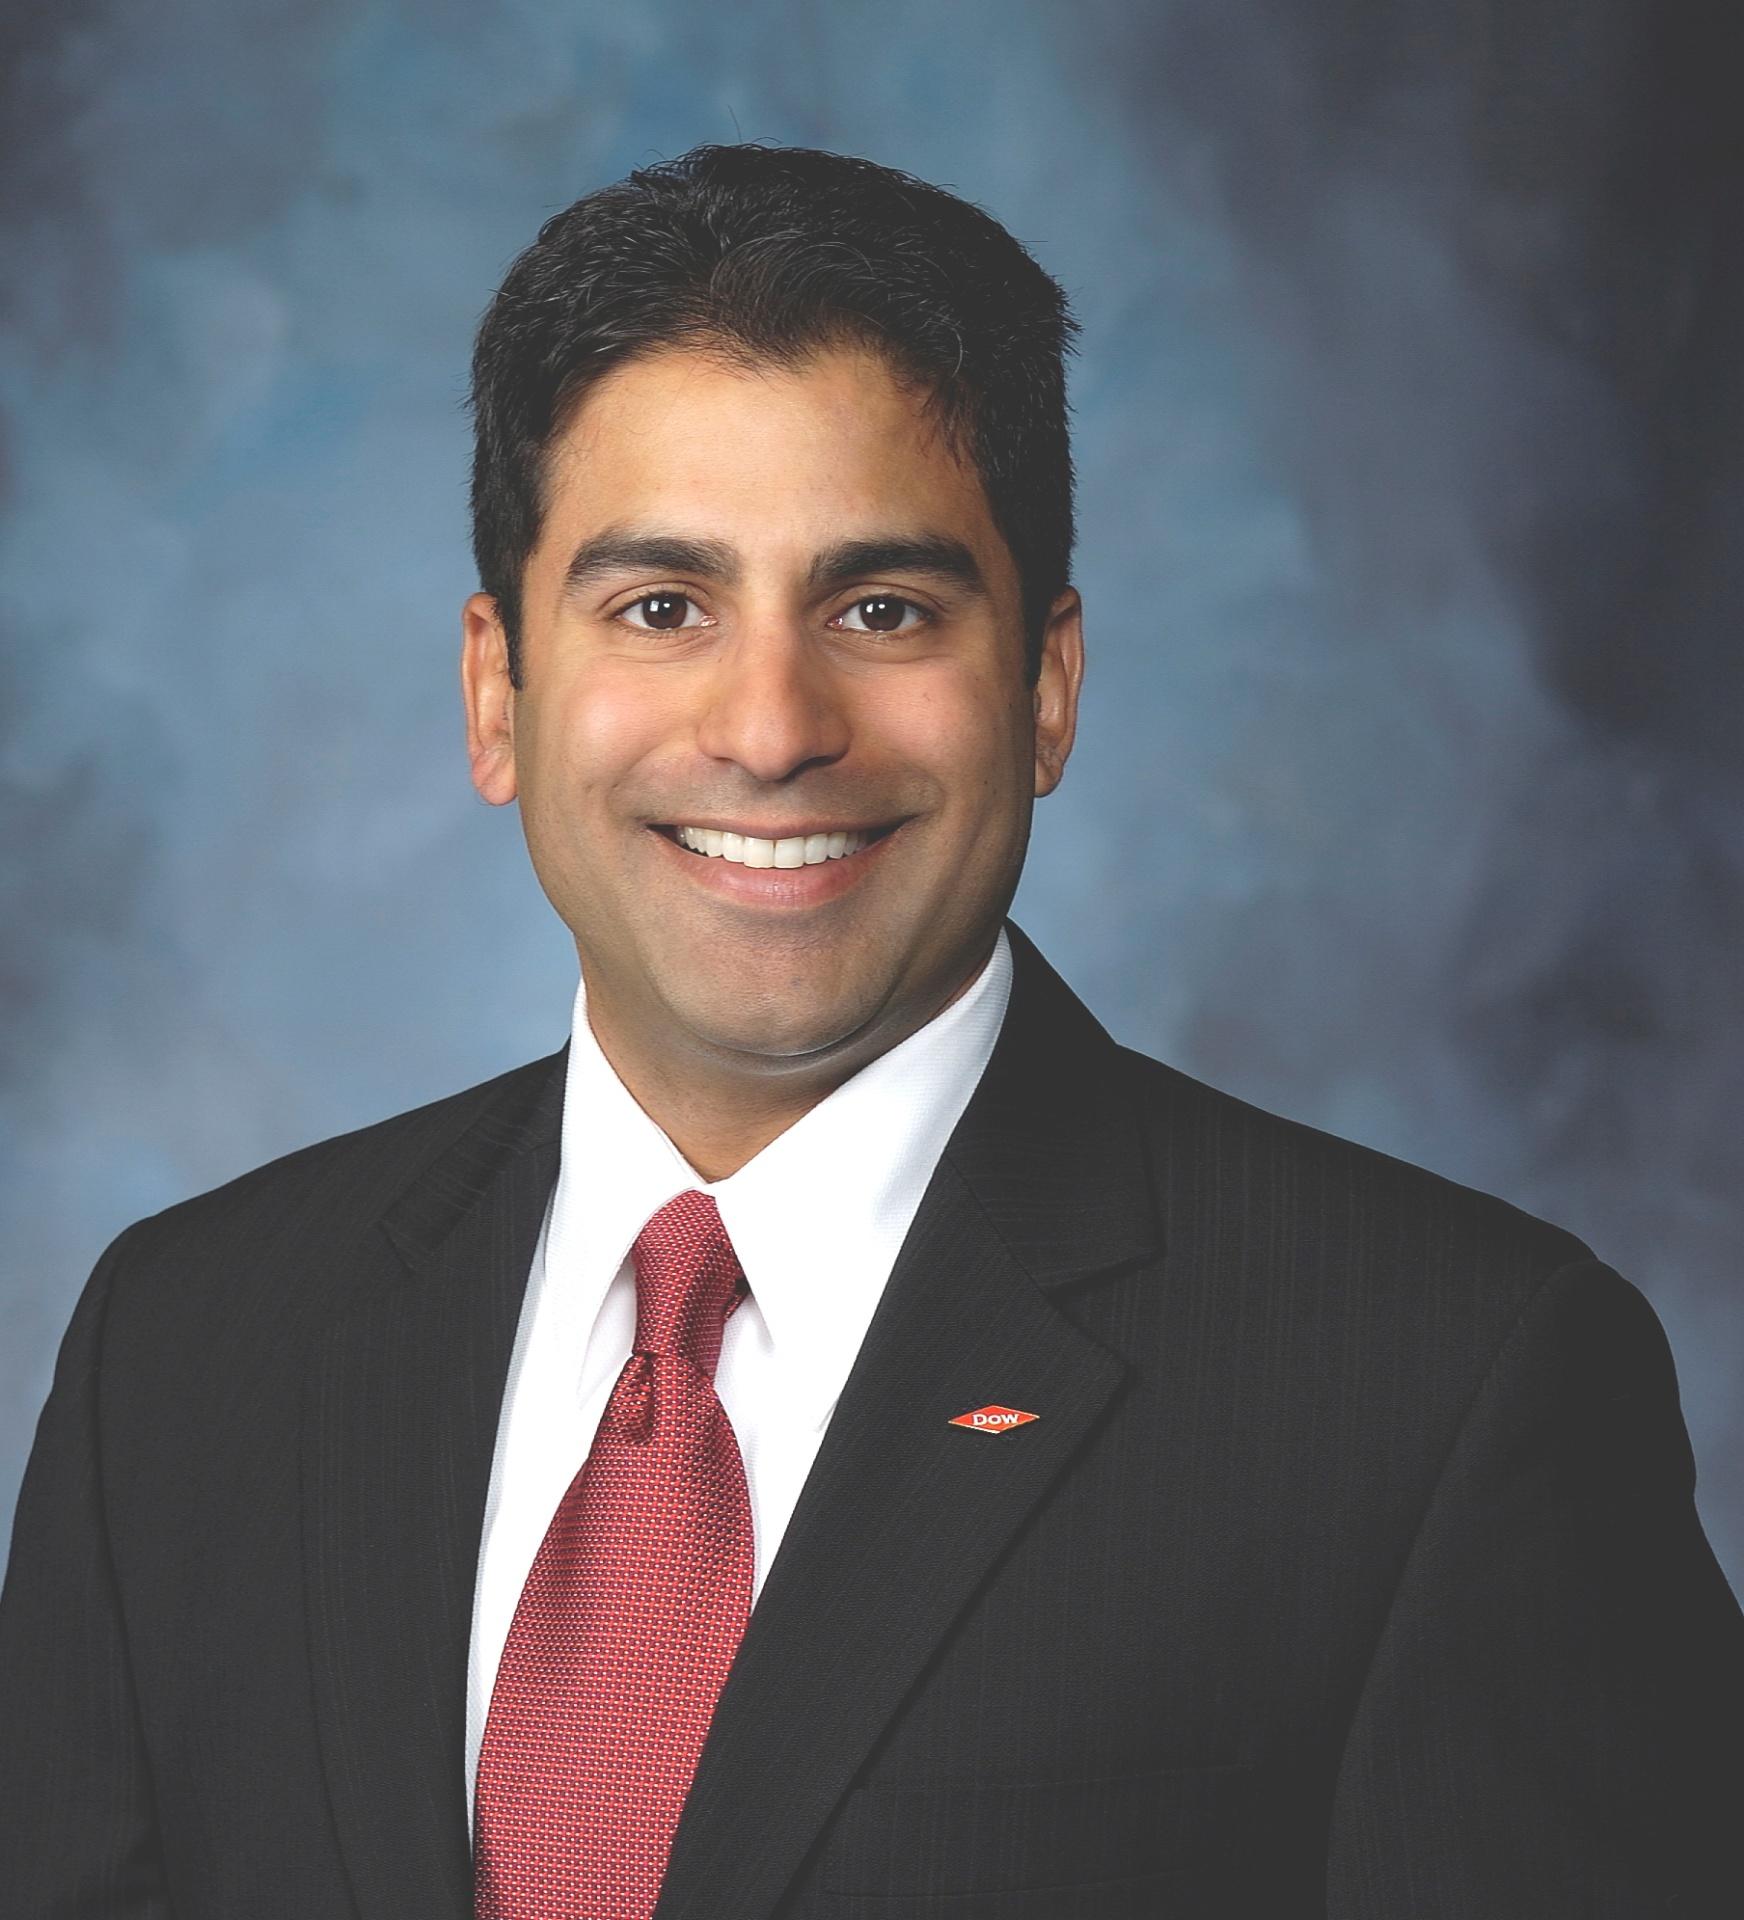 Ajay Badhwar